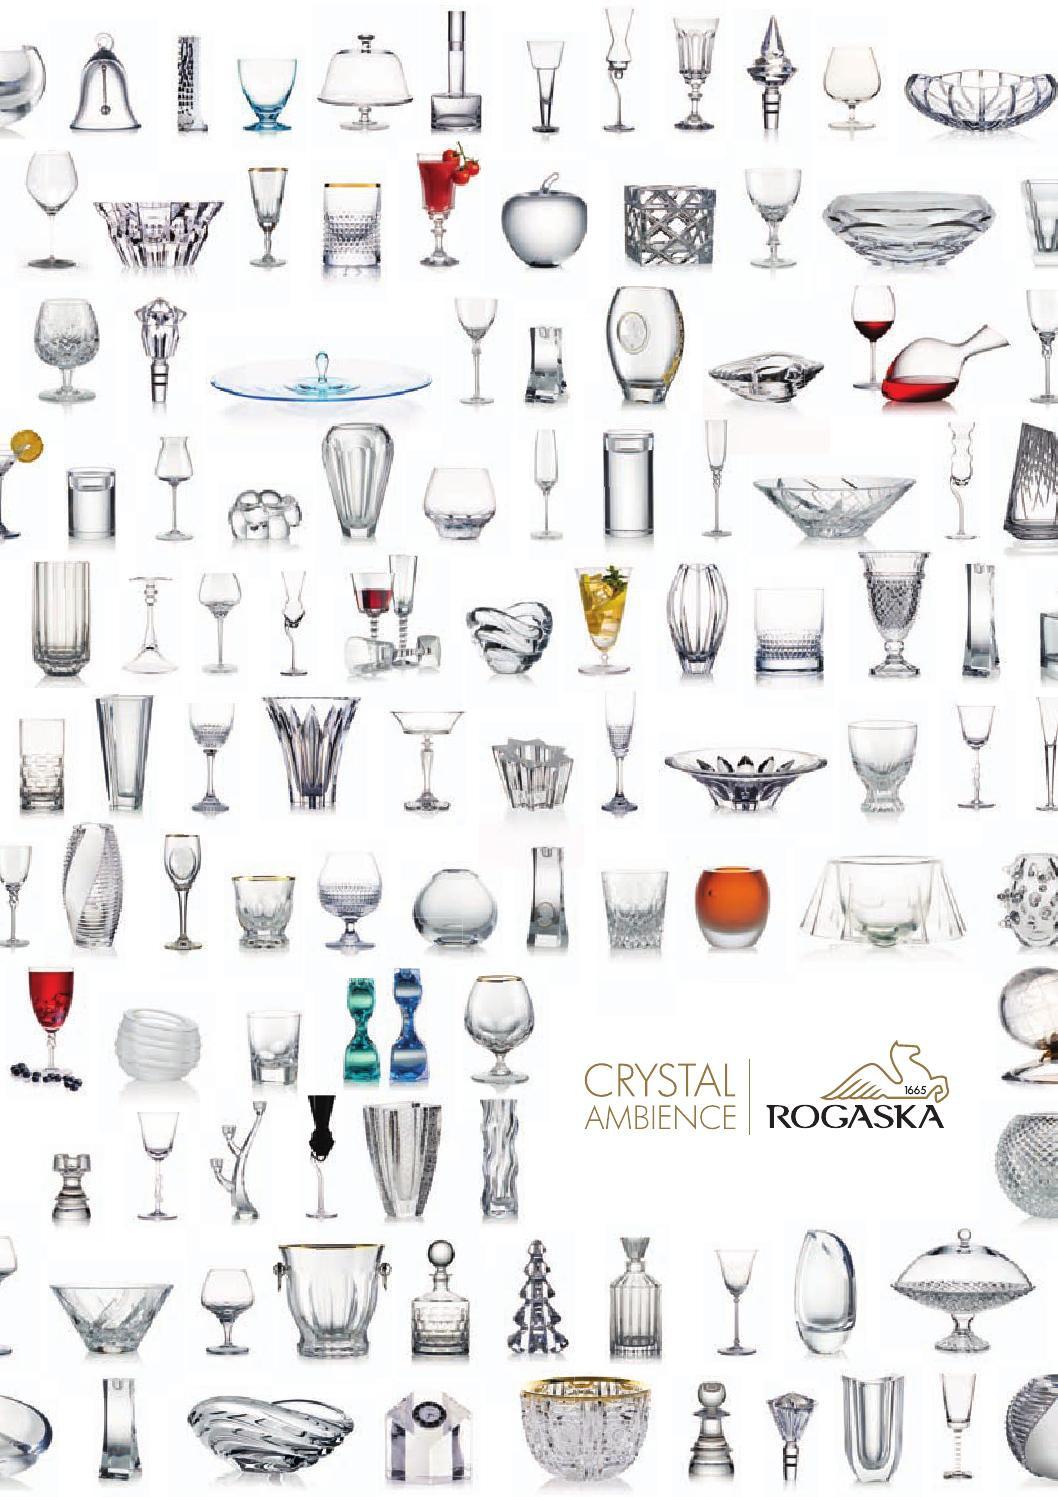 Rogaska Crystal Vase Patterns Of Rogaaka Crystal 2015 by Gerri Pa¤rson issuu Regarding Page 1